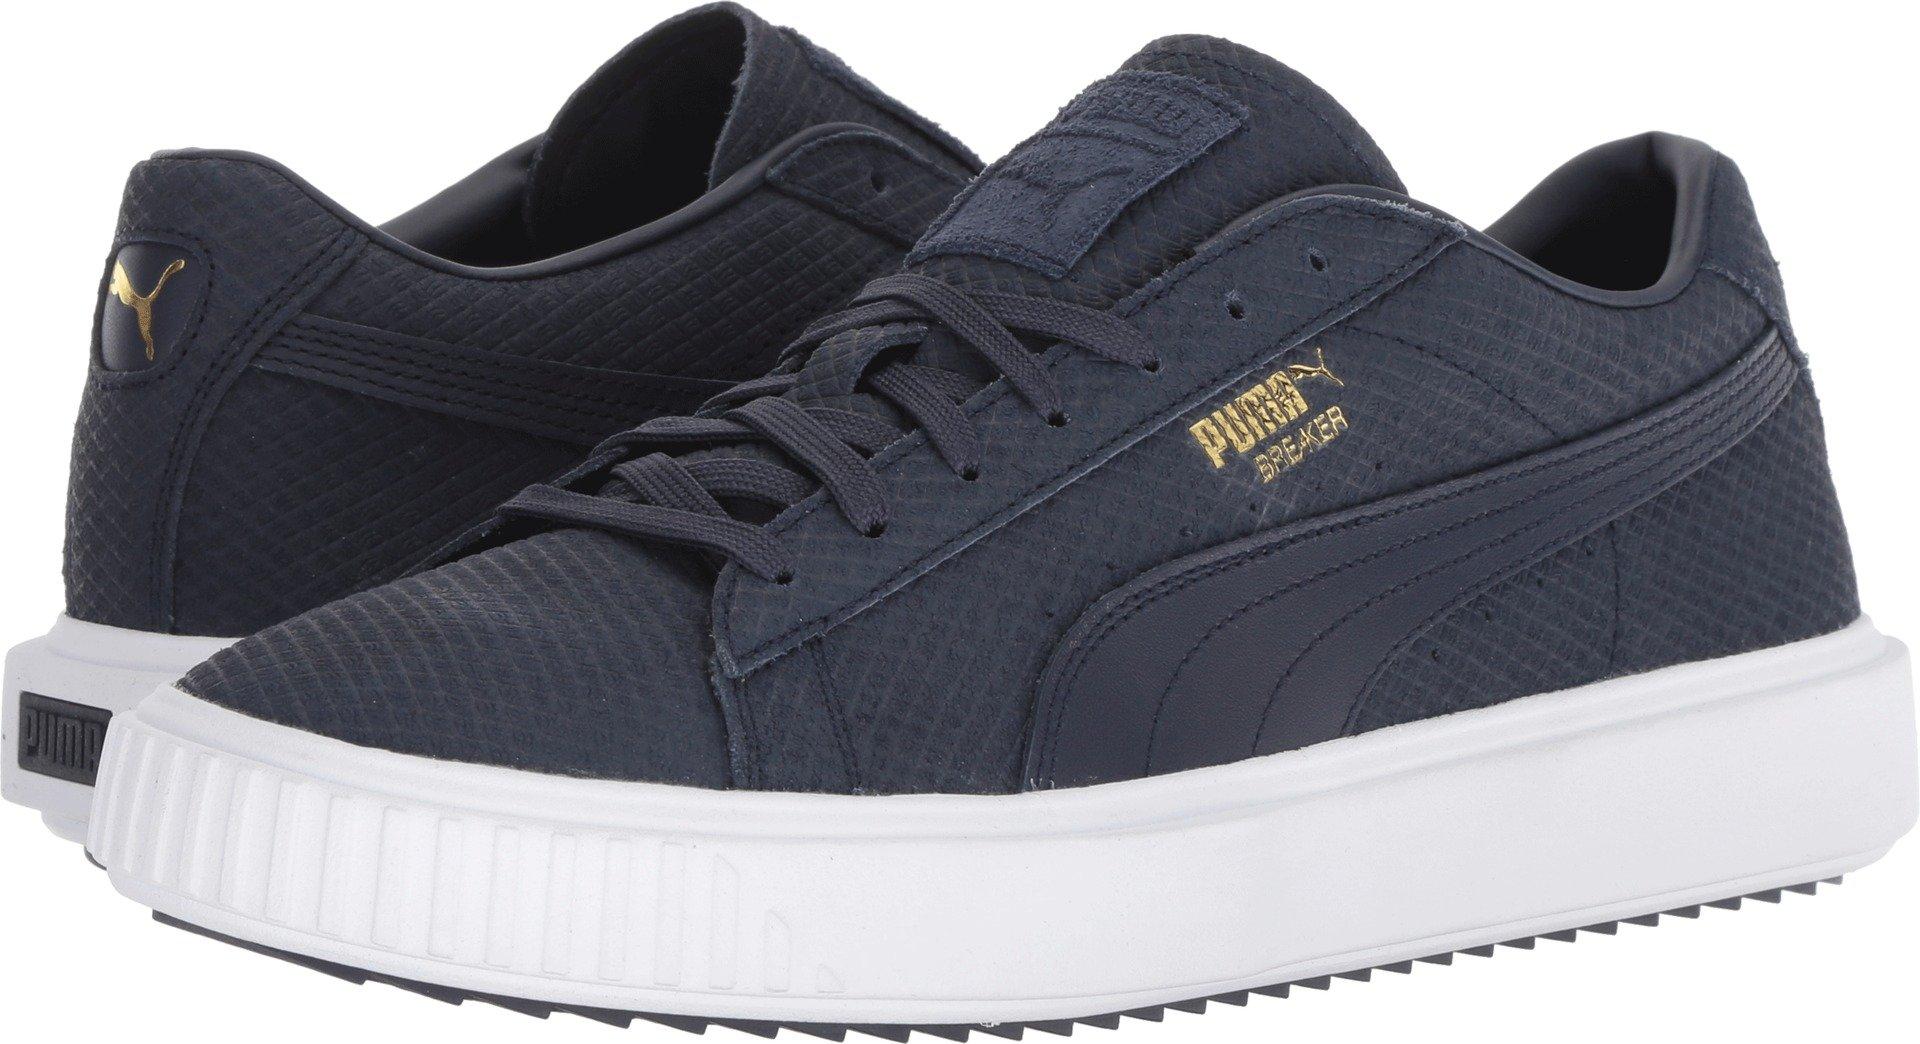 PUMA Men's Breaker Suede Sneaker,Peacoat,10.5